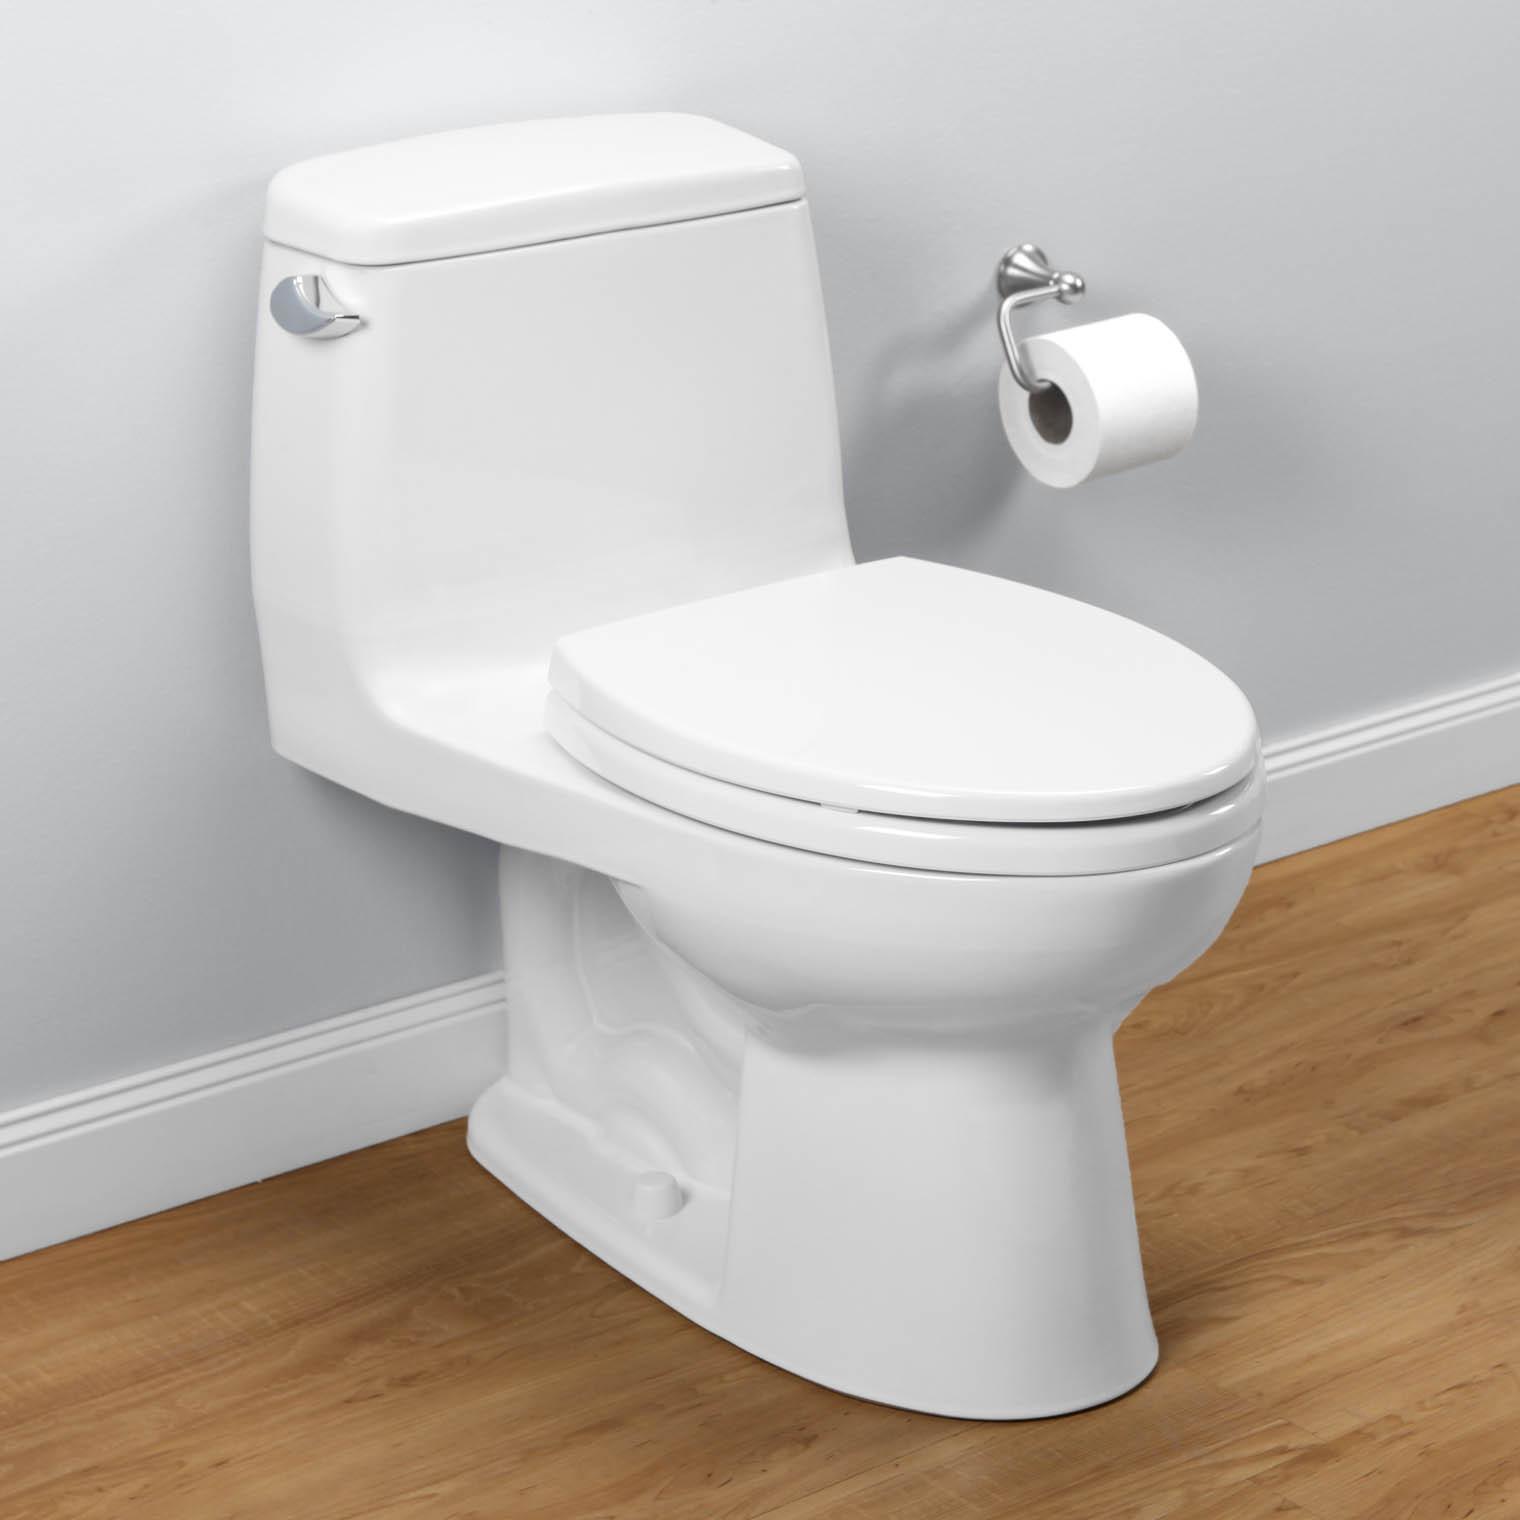 gatti-plumbing-bathroom-toilet-installation-repair